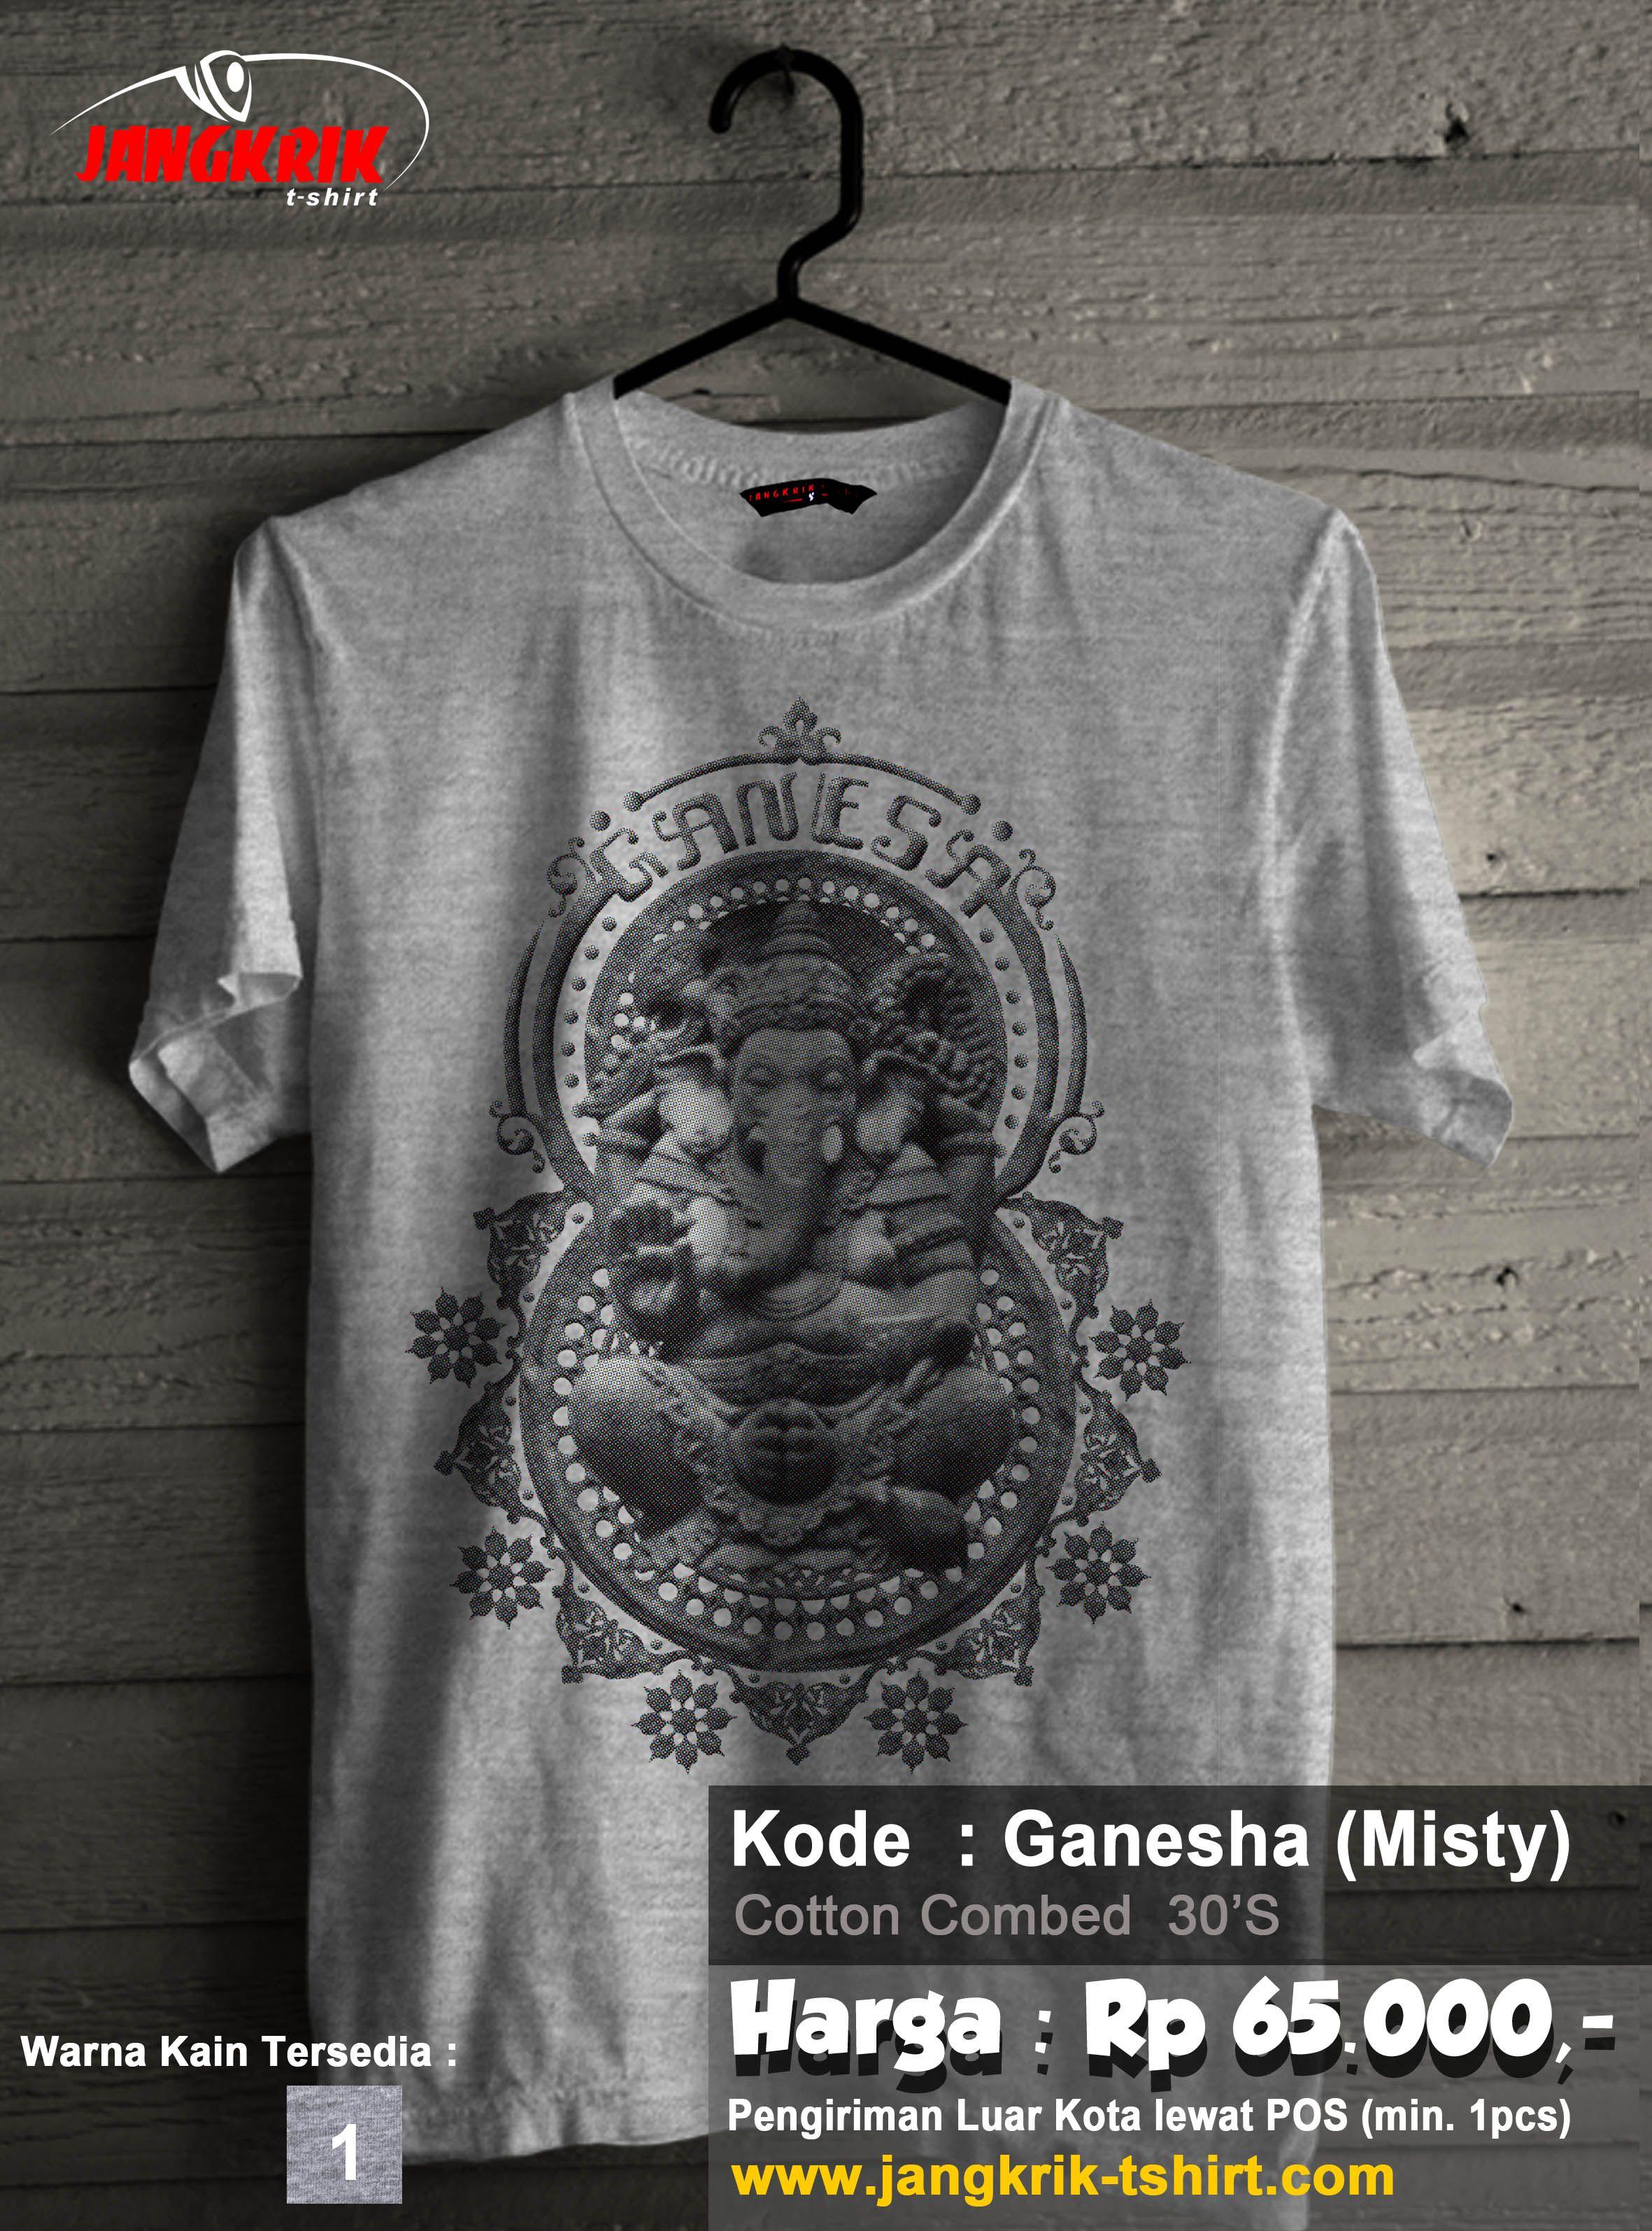 Koas Ganesha Bahan Cotton Combed 30s Warna Abu Misty Size Jaket Fleece Silver S M L Xl Harga Rp 650000 Fast Respon Sms 0877 3862 6309 Wa 0878 3838 0888 Bbm